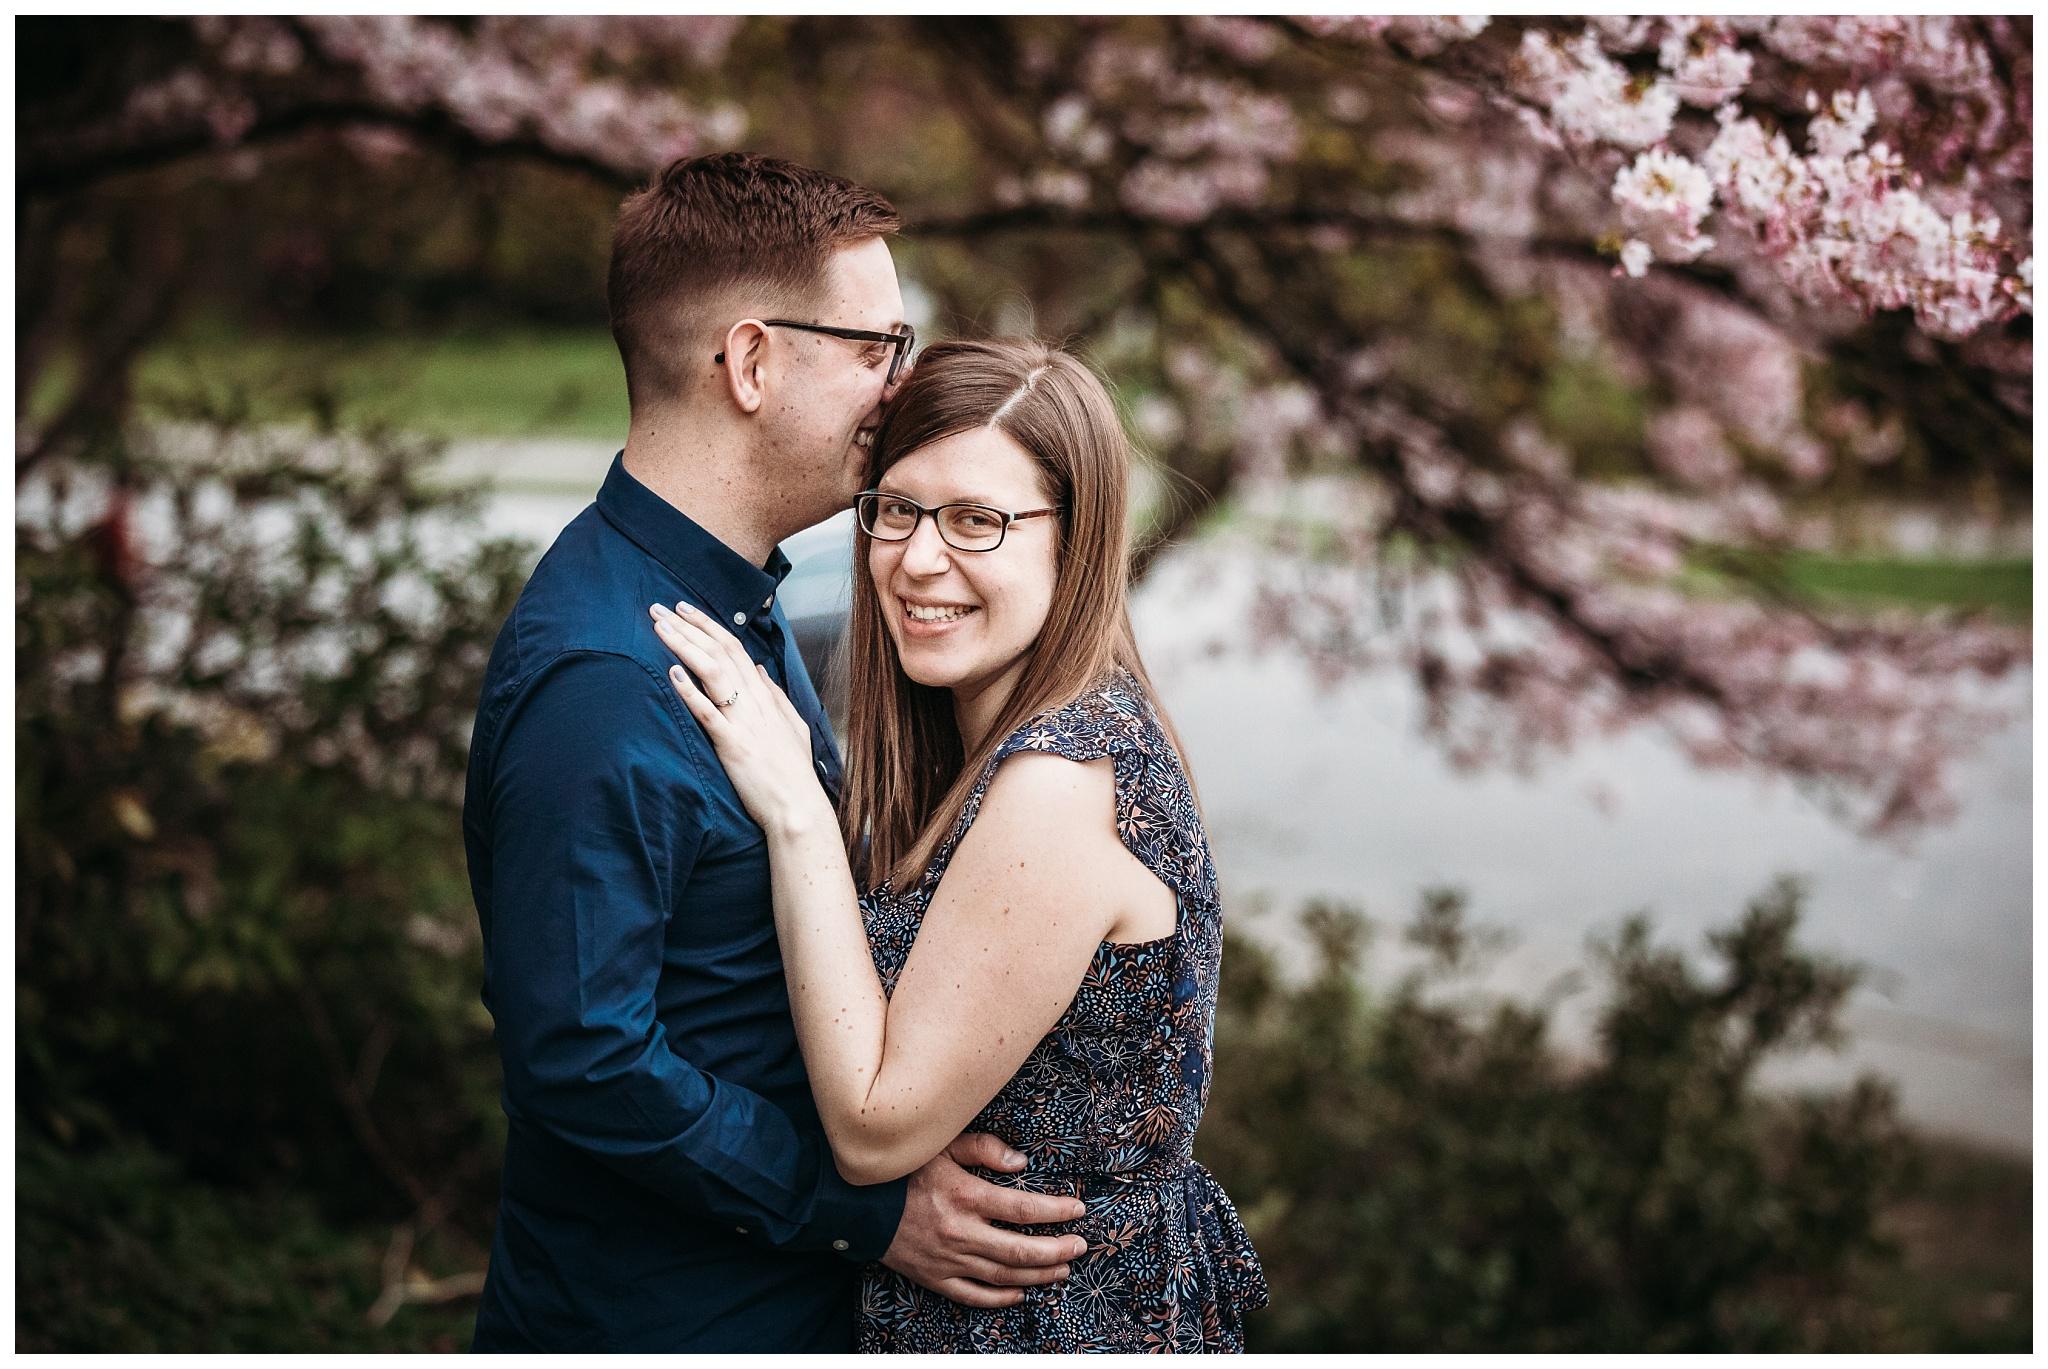 Queen Elizabeth Park Spring Engagement Photography Cherry Blossom Photos Couple Romantic_0012.jpg